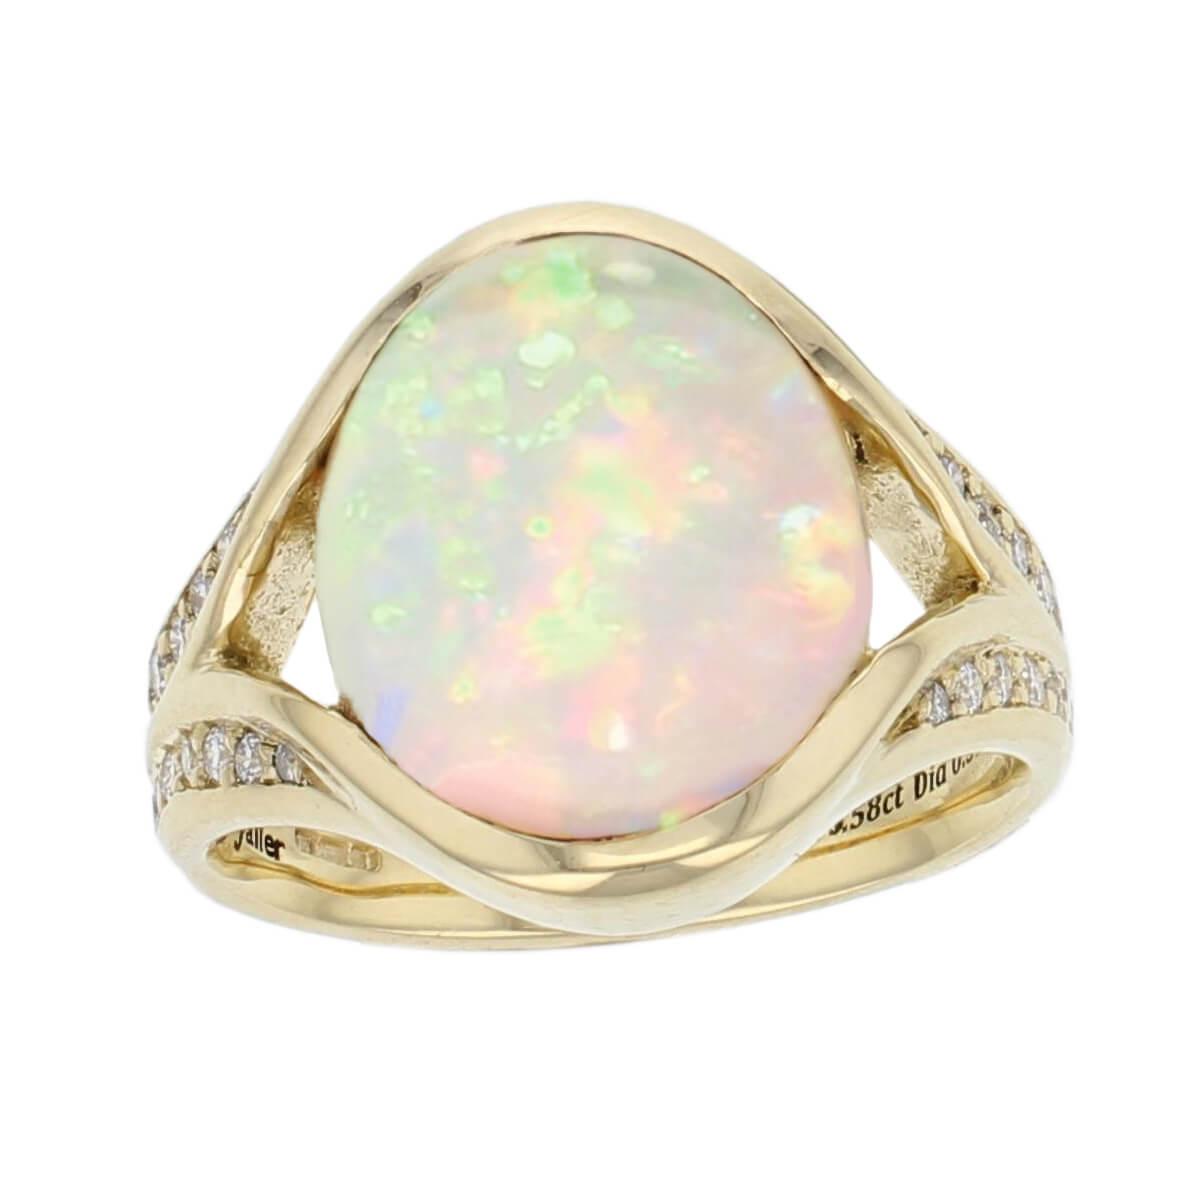 opal diamond ring, 18ct yellow gold oval cut cabochon opal gemstone & diamond multistone dress ring, designer jewellery, gem, jewelry, handmade by Faller, Derry, Londonderry, Northern Ireland, Irish hand crafted, shoulder set